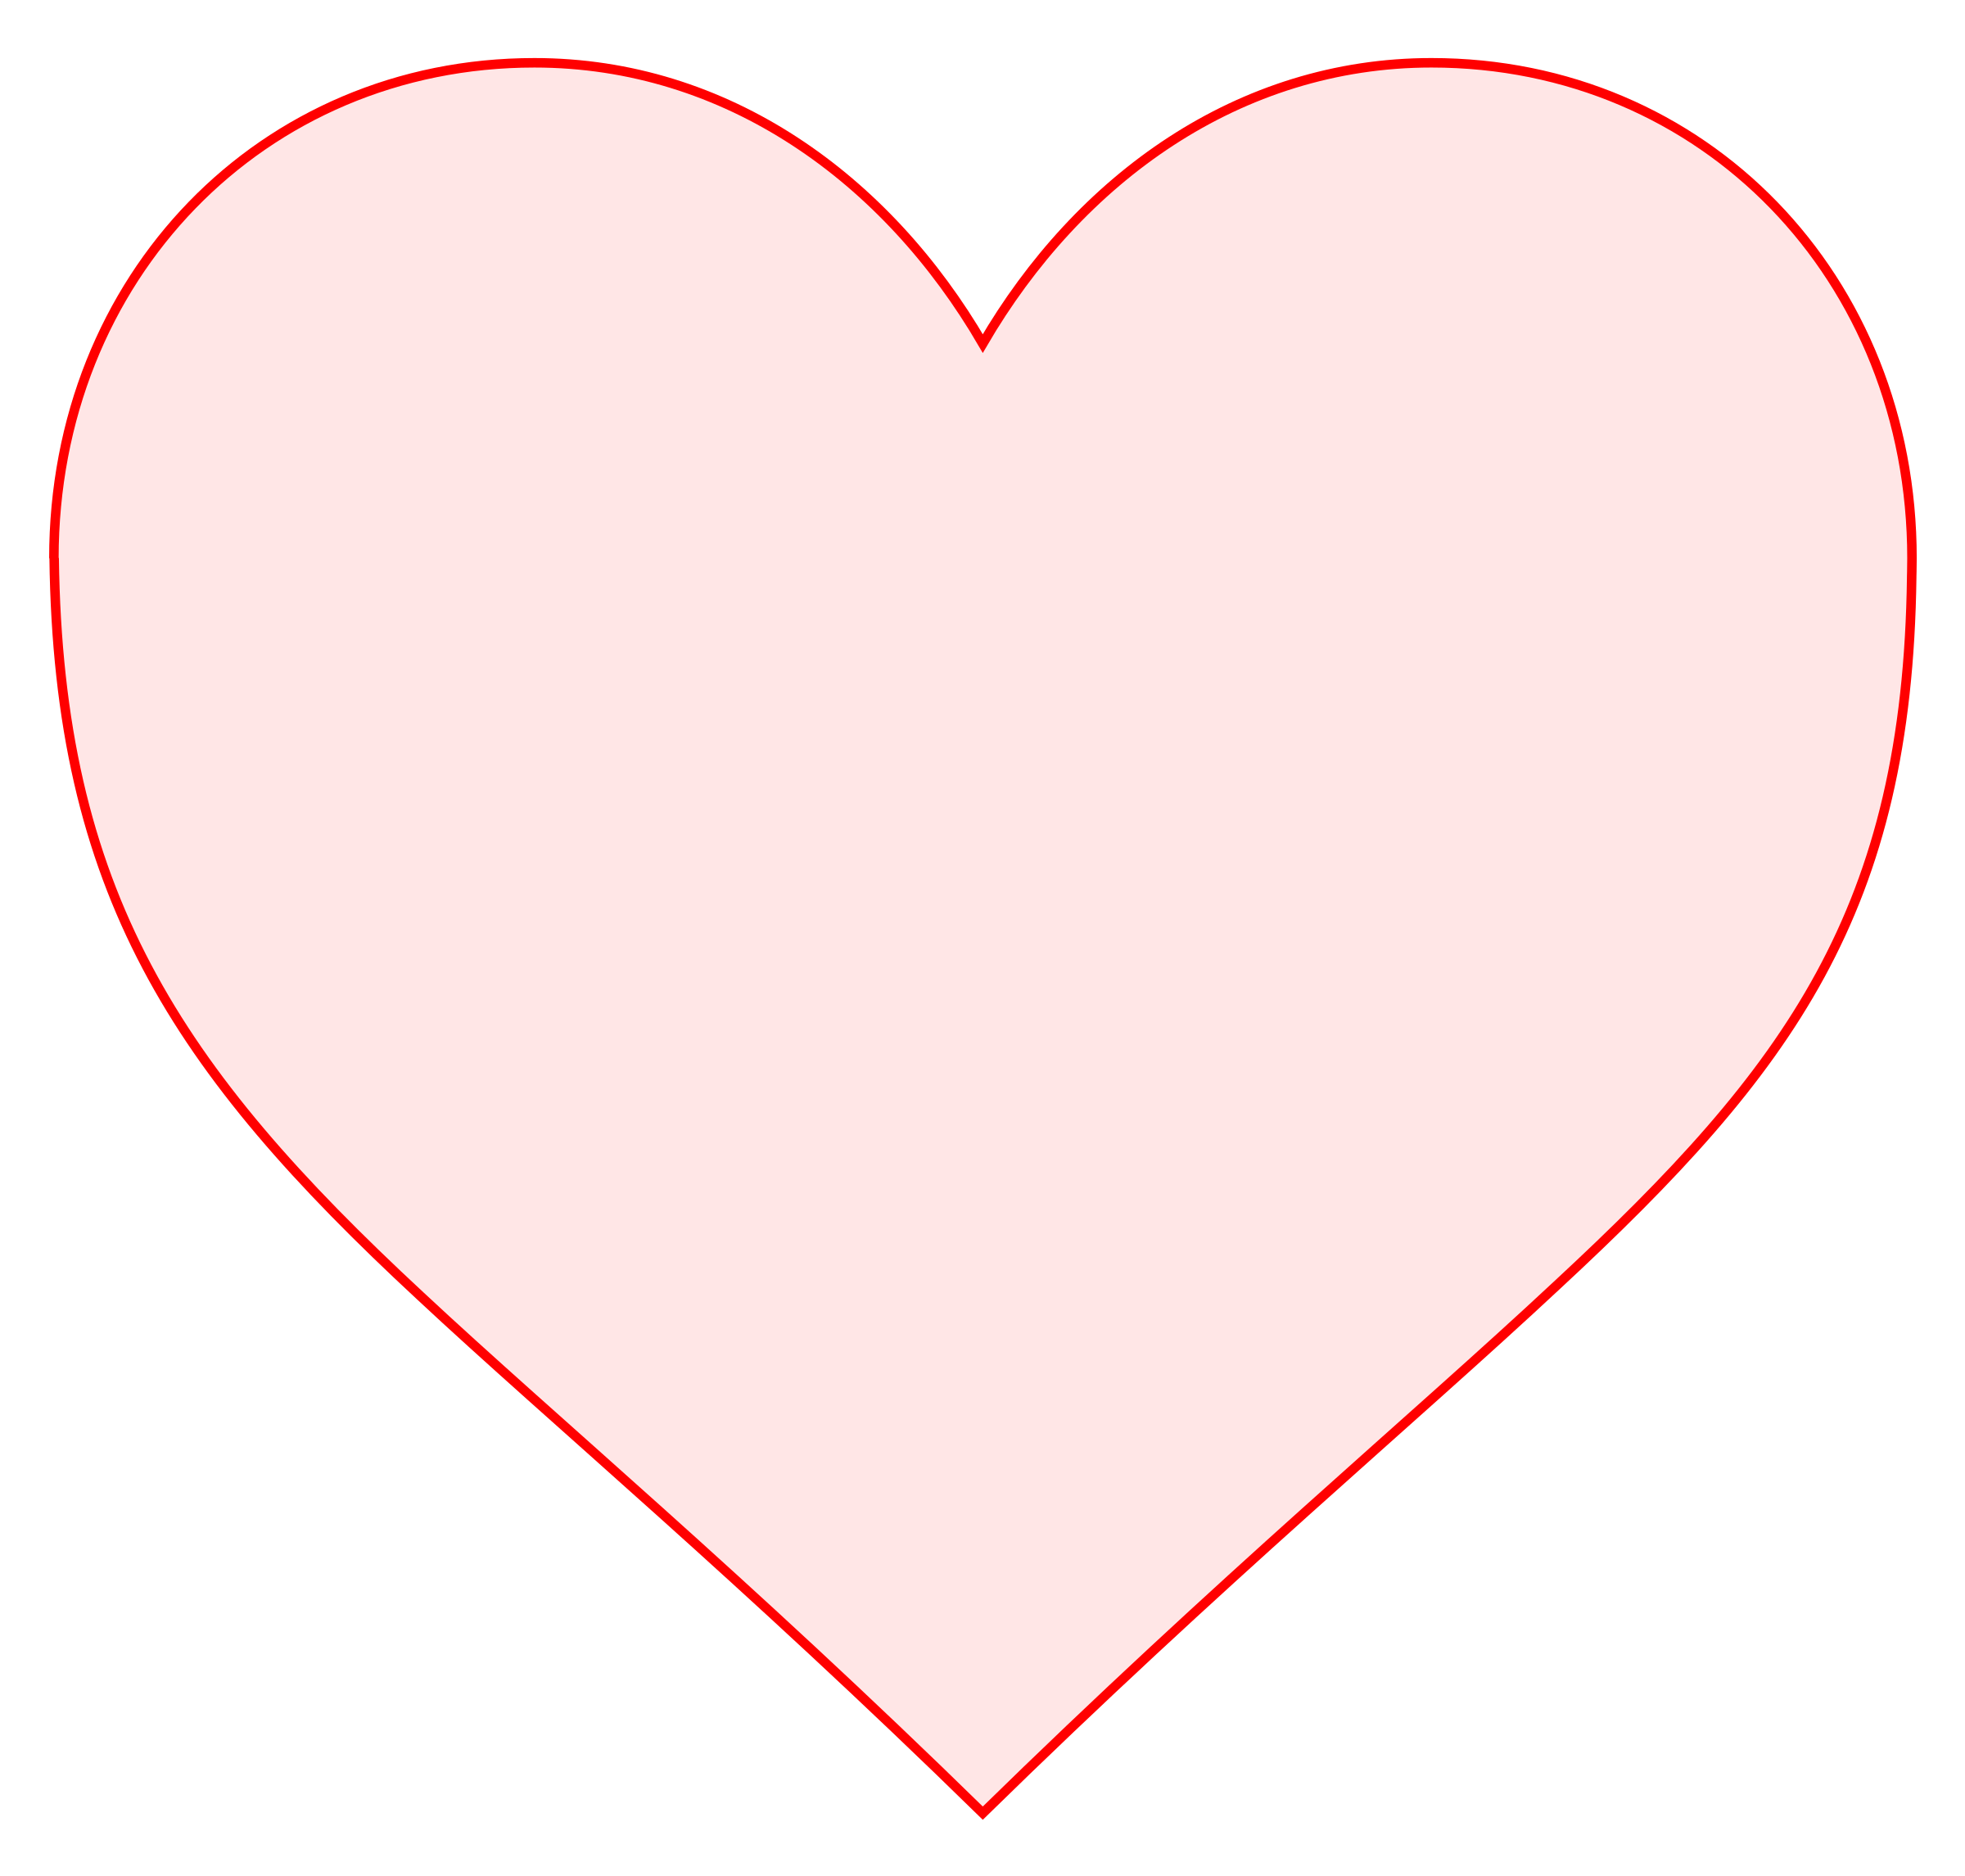 Pink heart outline clipart image transparent download Clipart - pink heart image transparent download